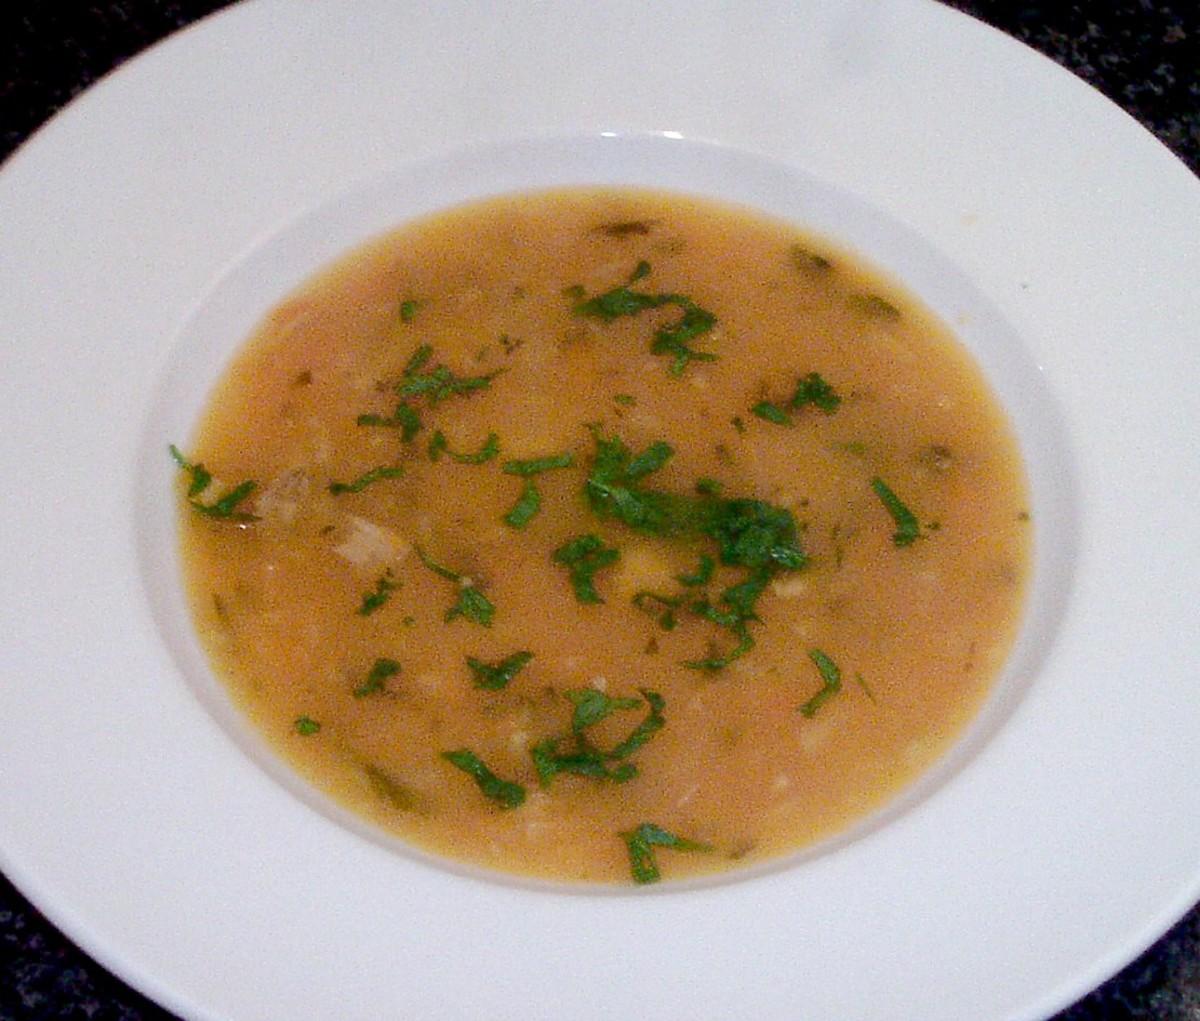 Pheasant Breast Wild Game Soup Recipe